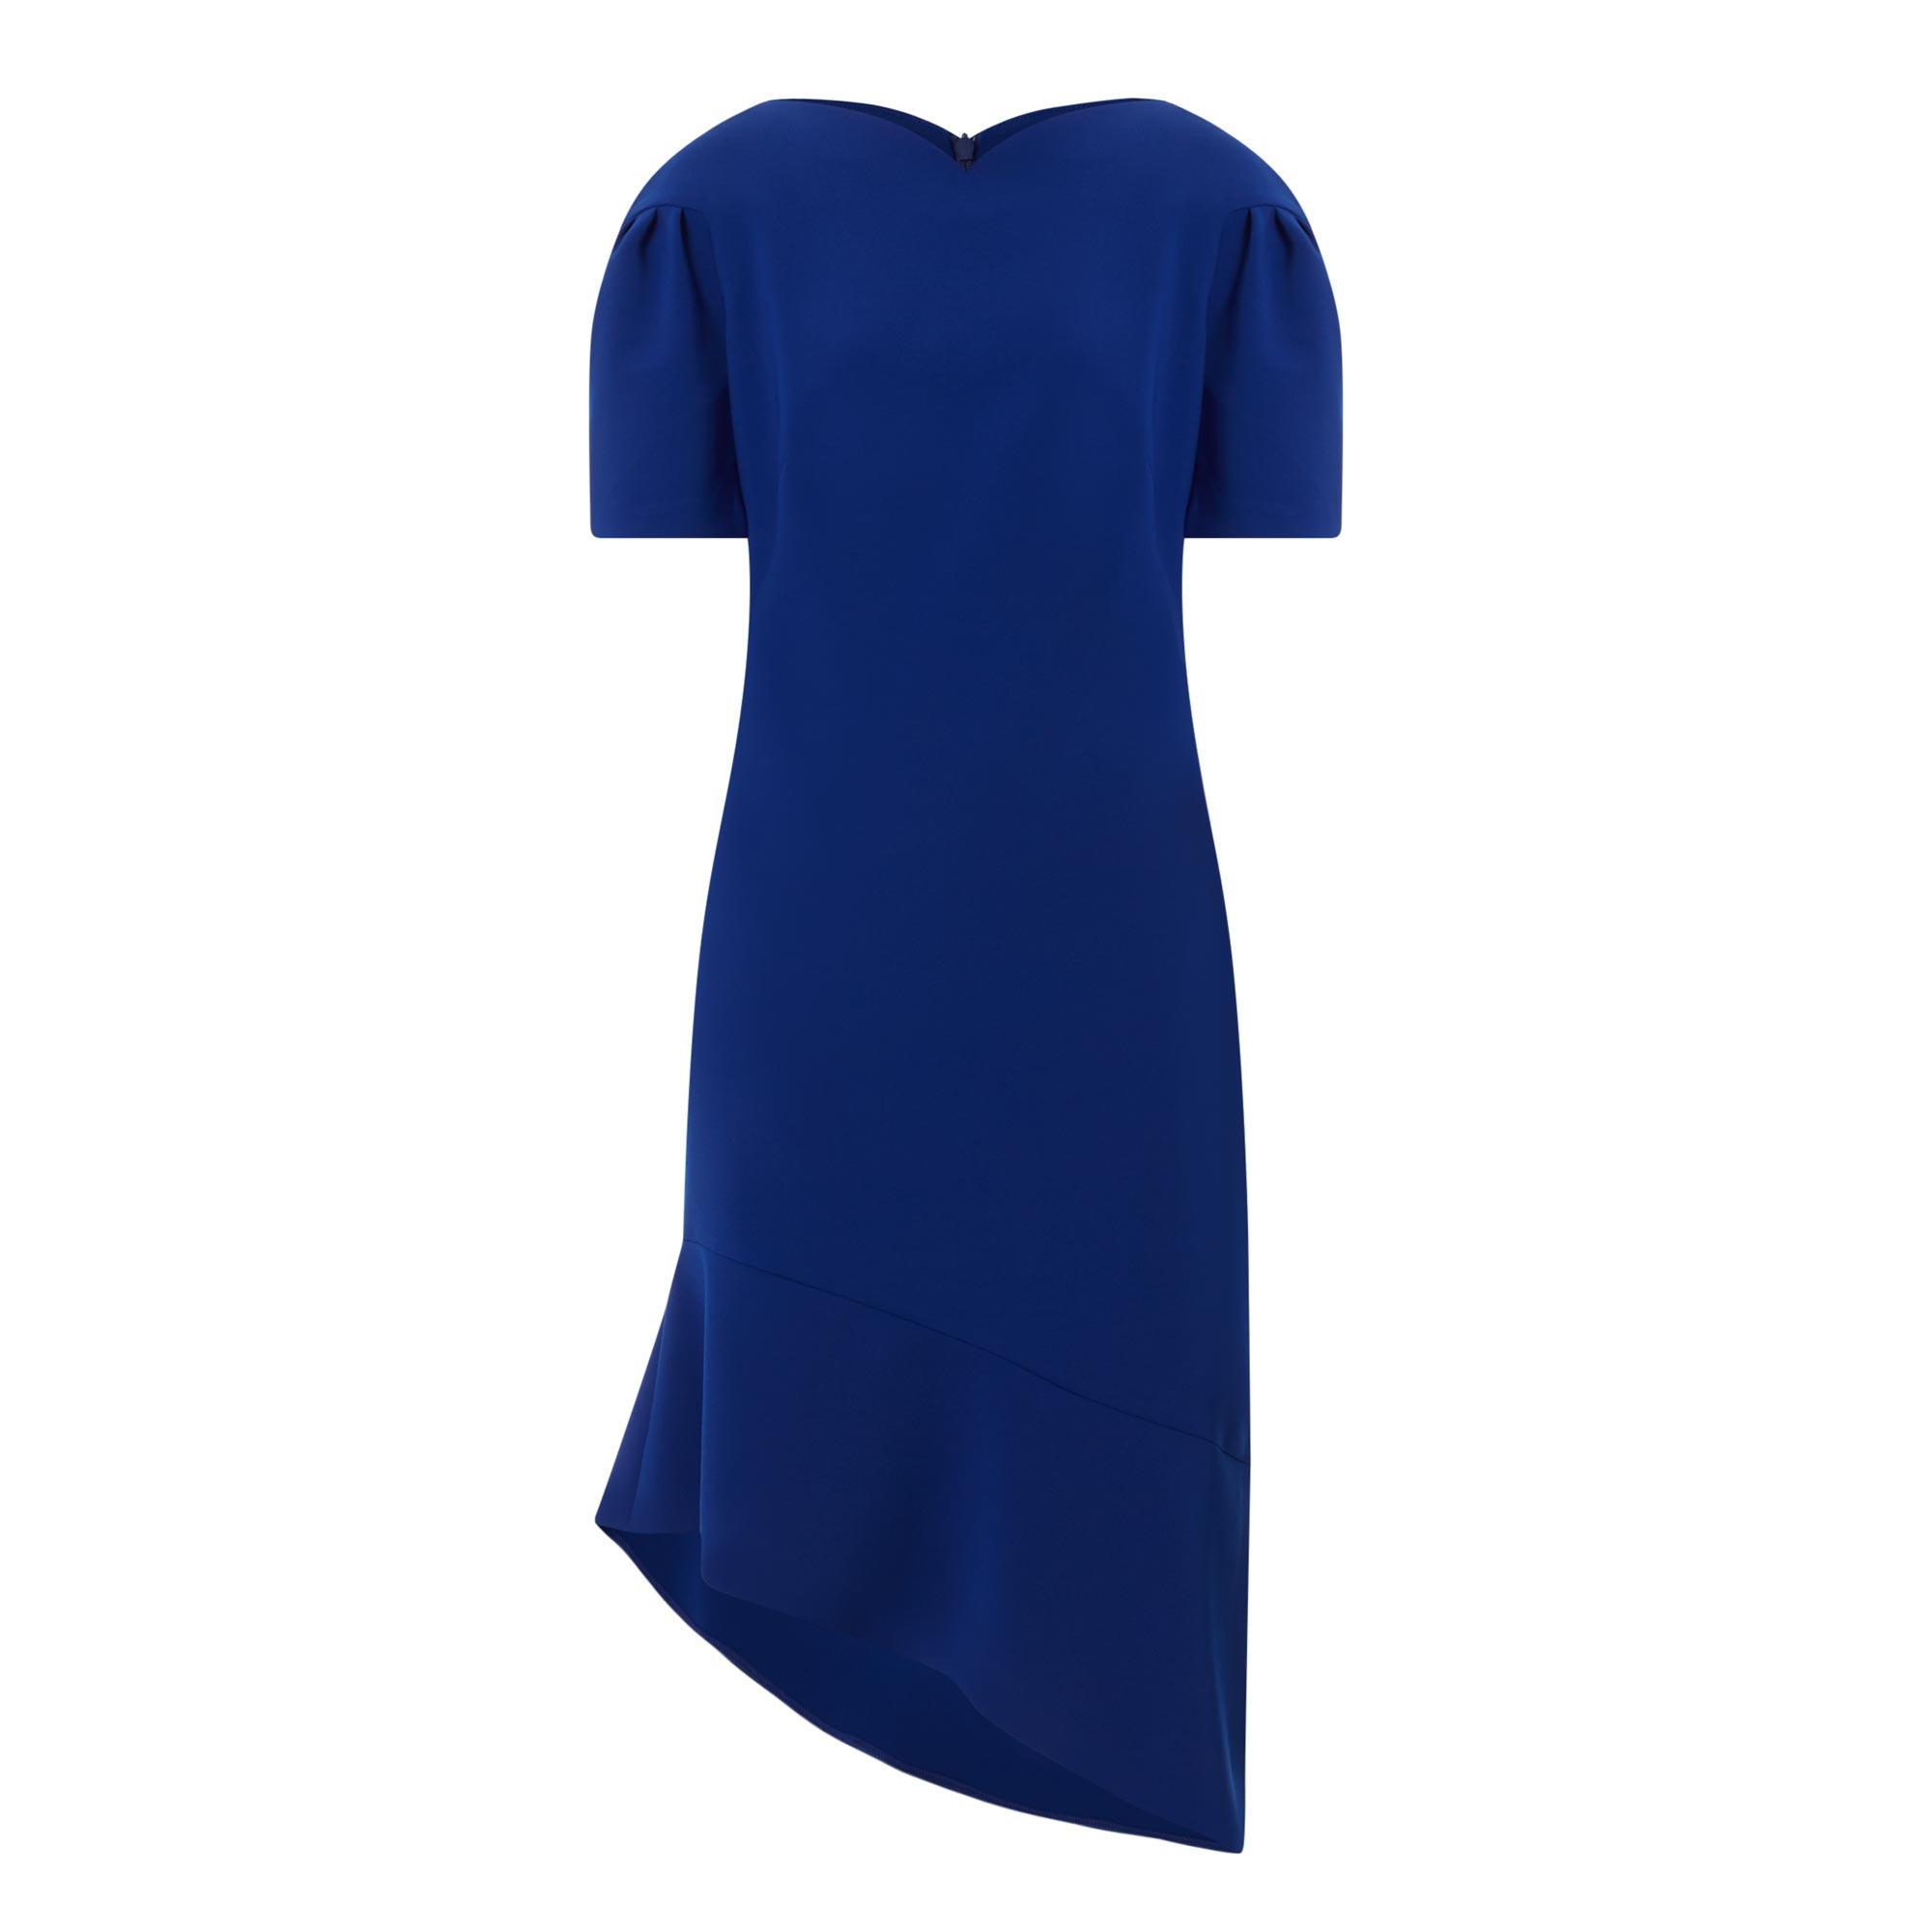 141361184: Asymmetric Hem Dress